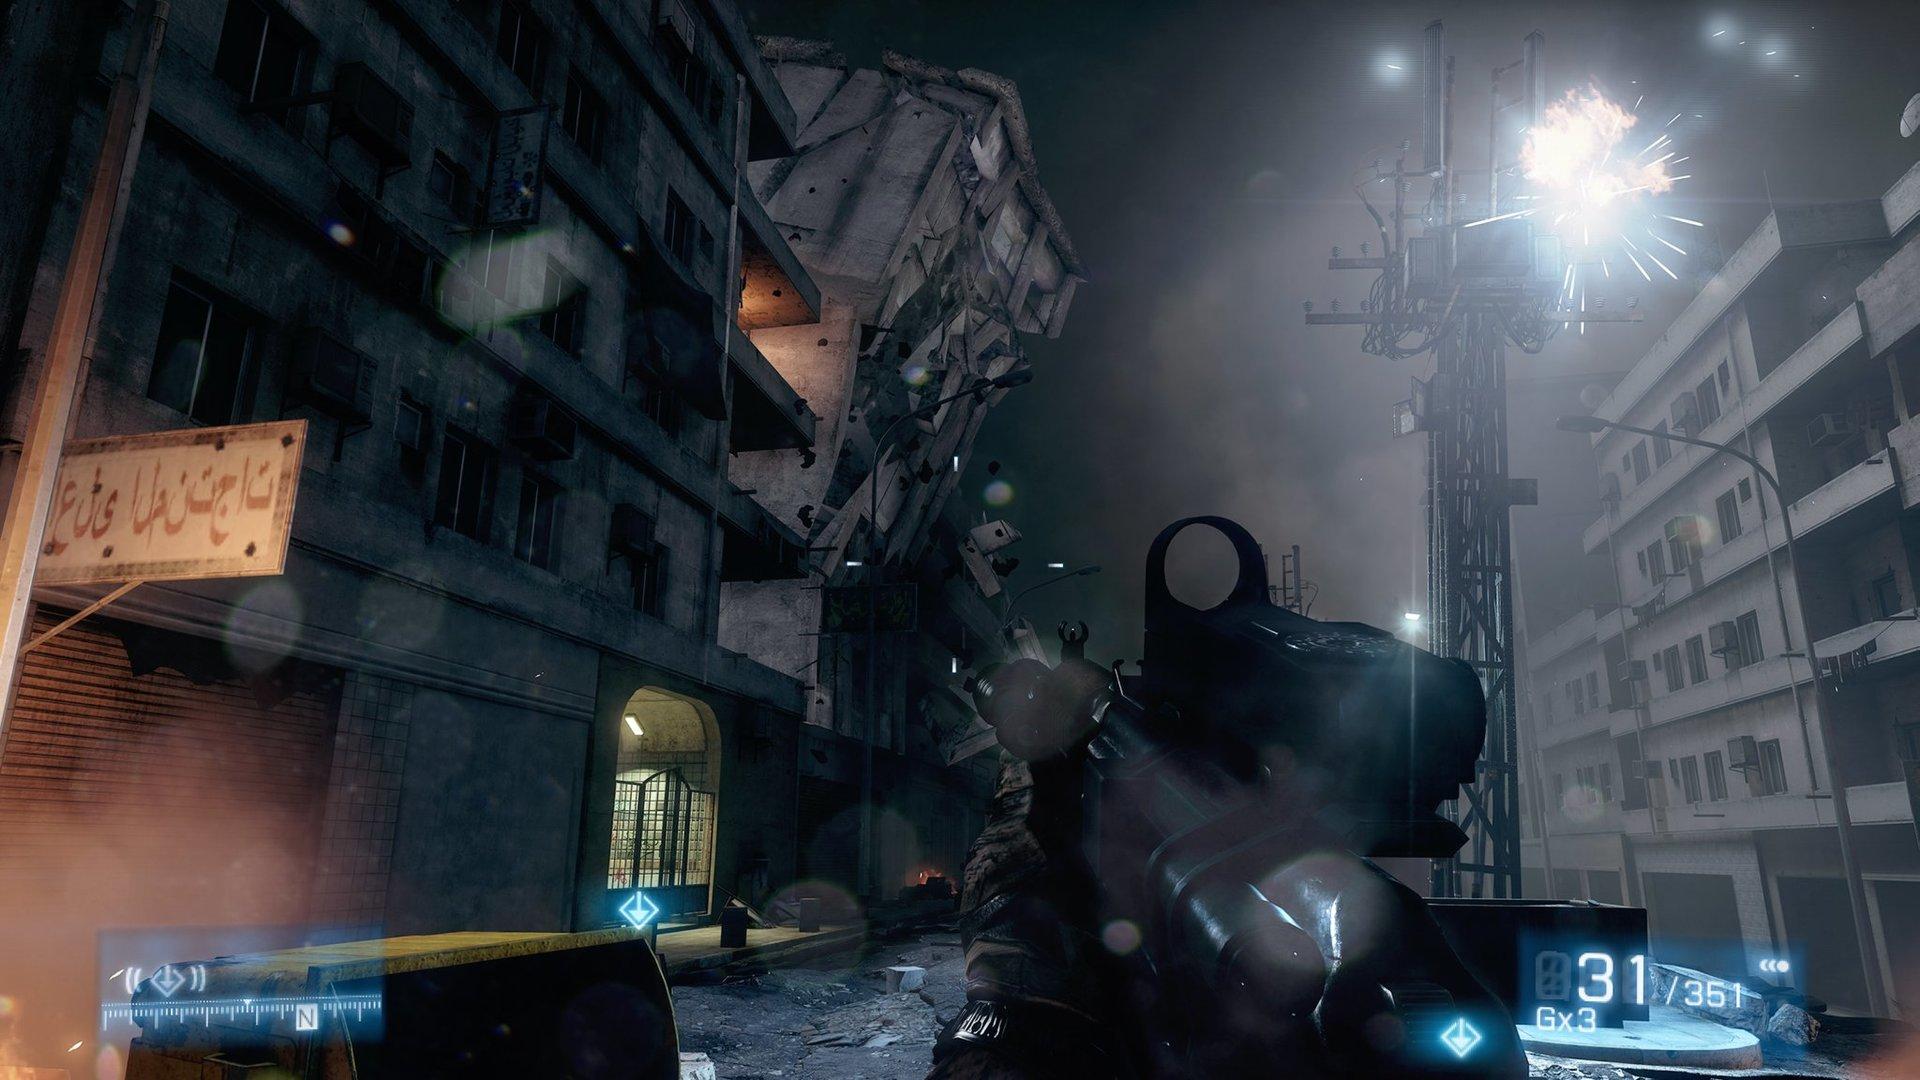 Battlefield 3 – 06.10.2011